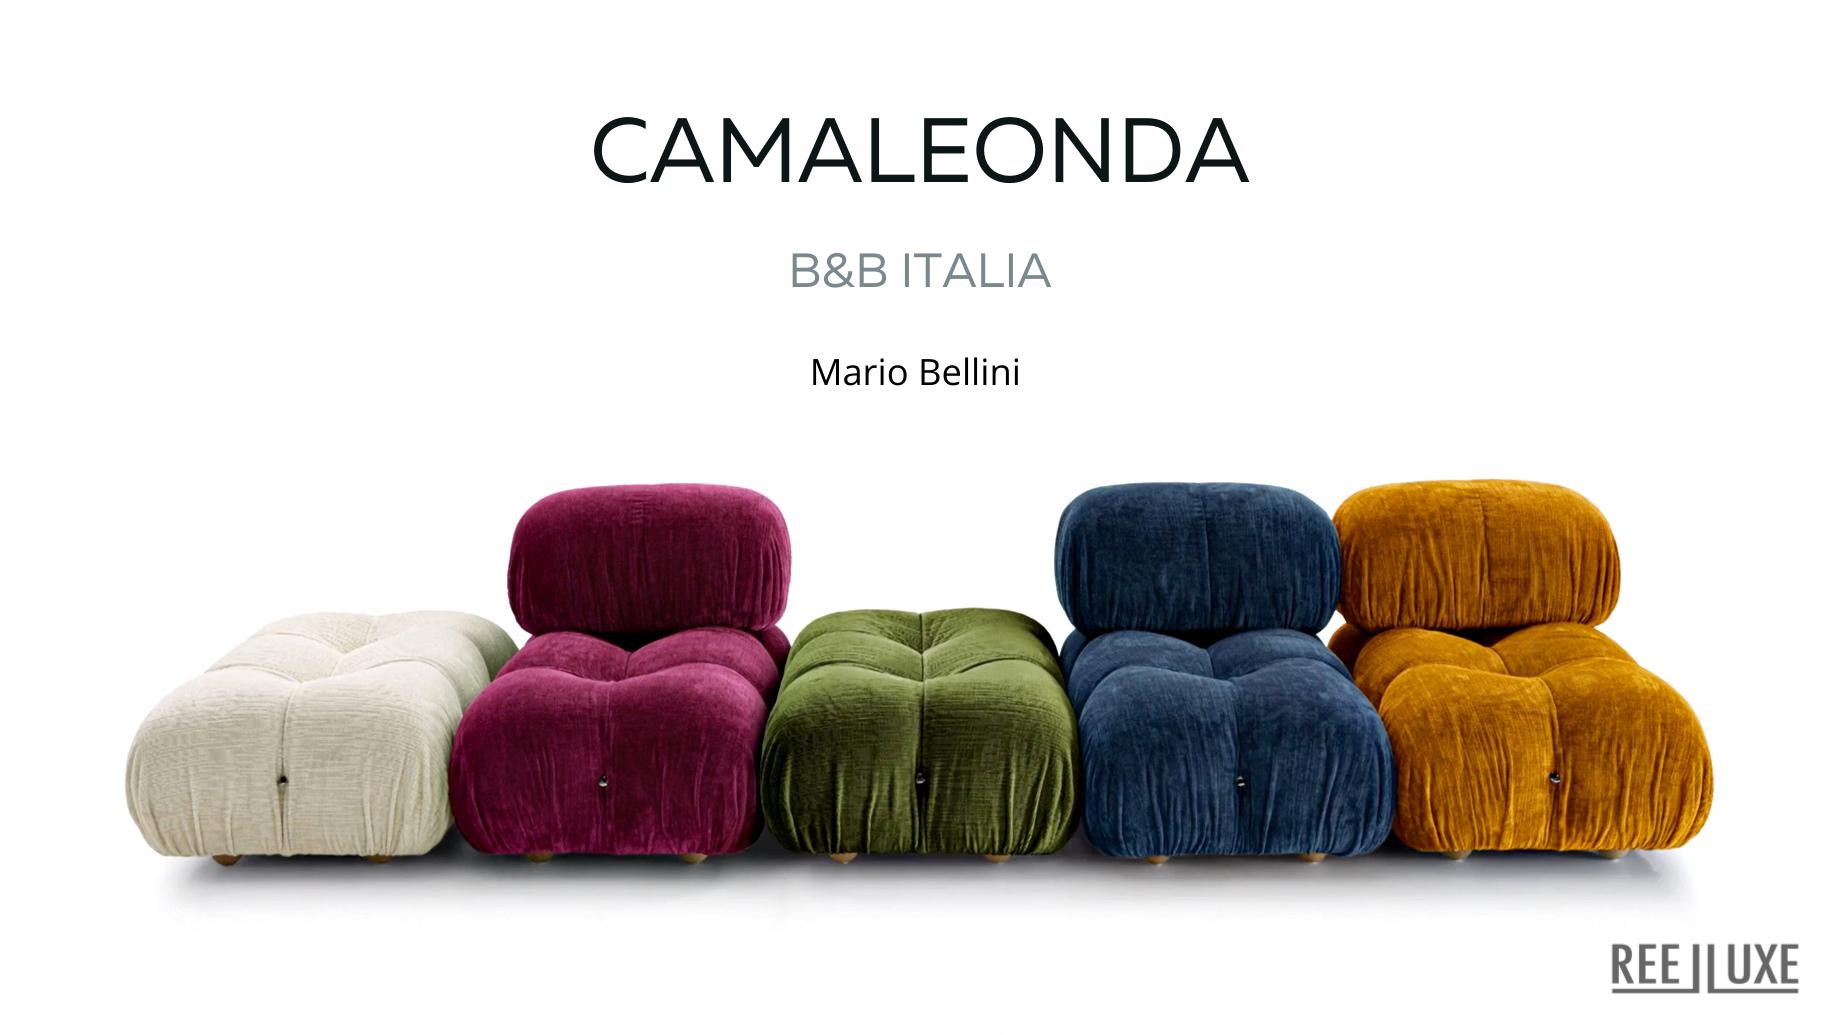 Camaleonda Classic Sofa Collection B&B Italia - Mario Bellini